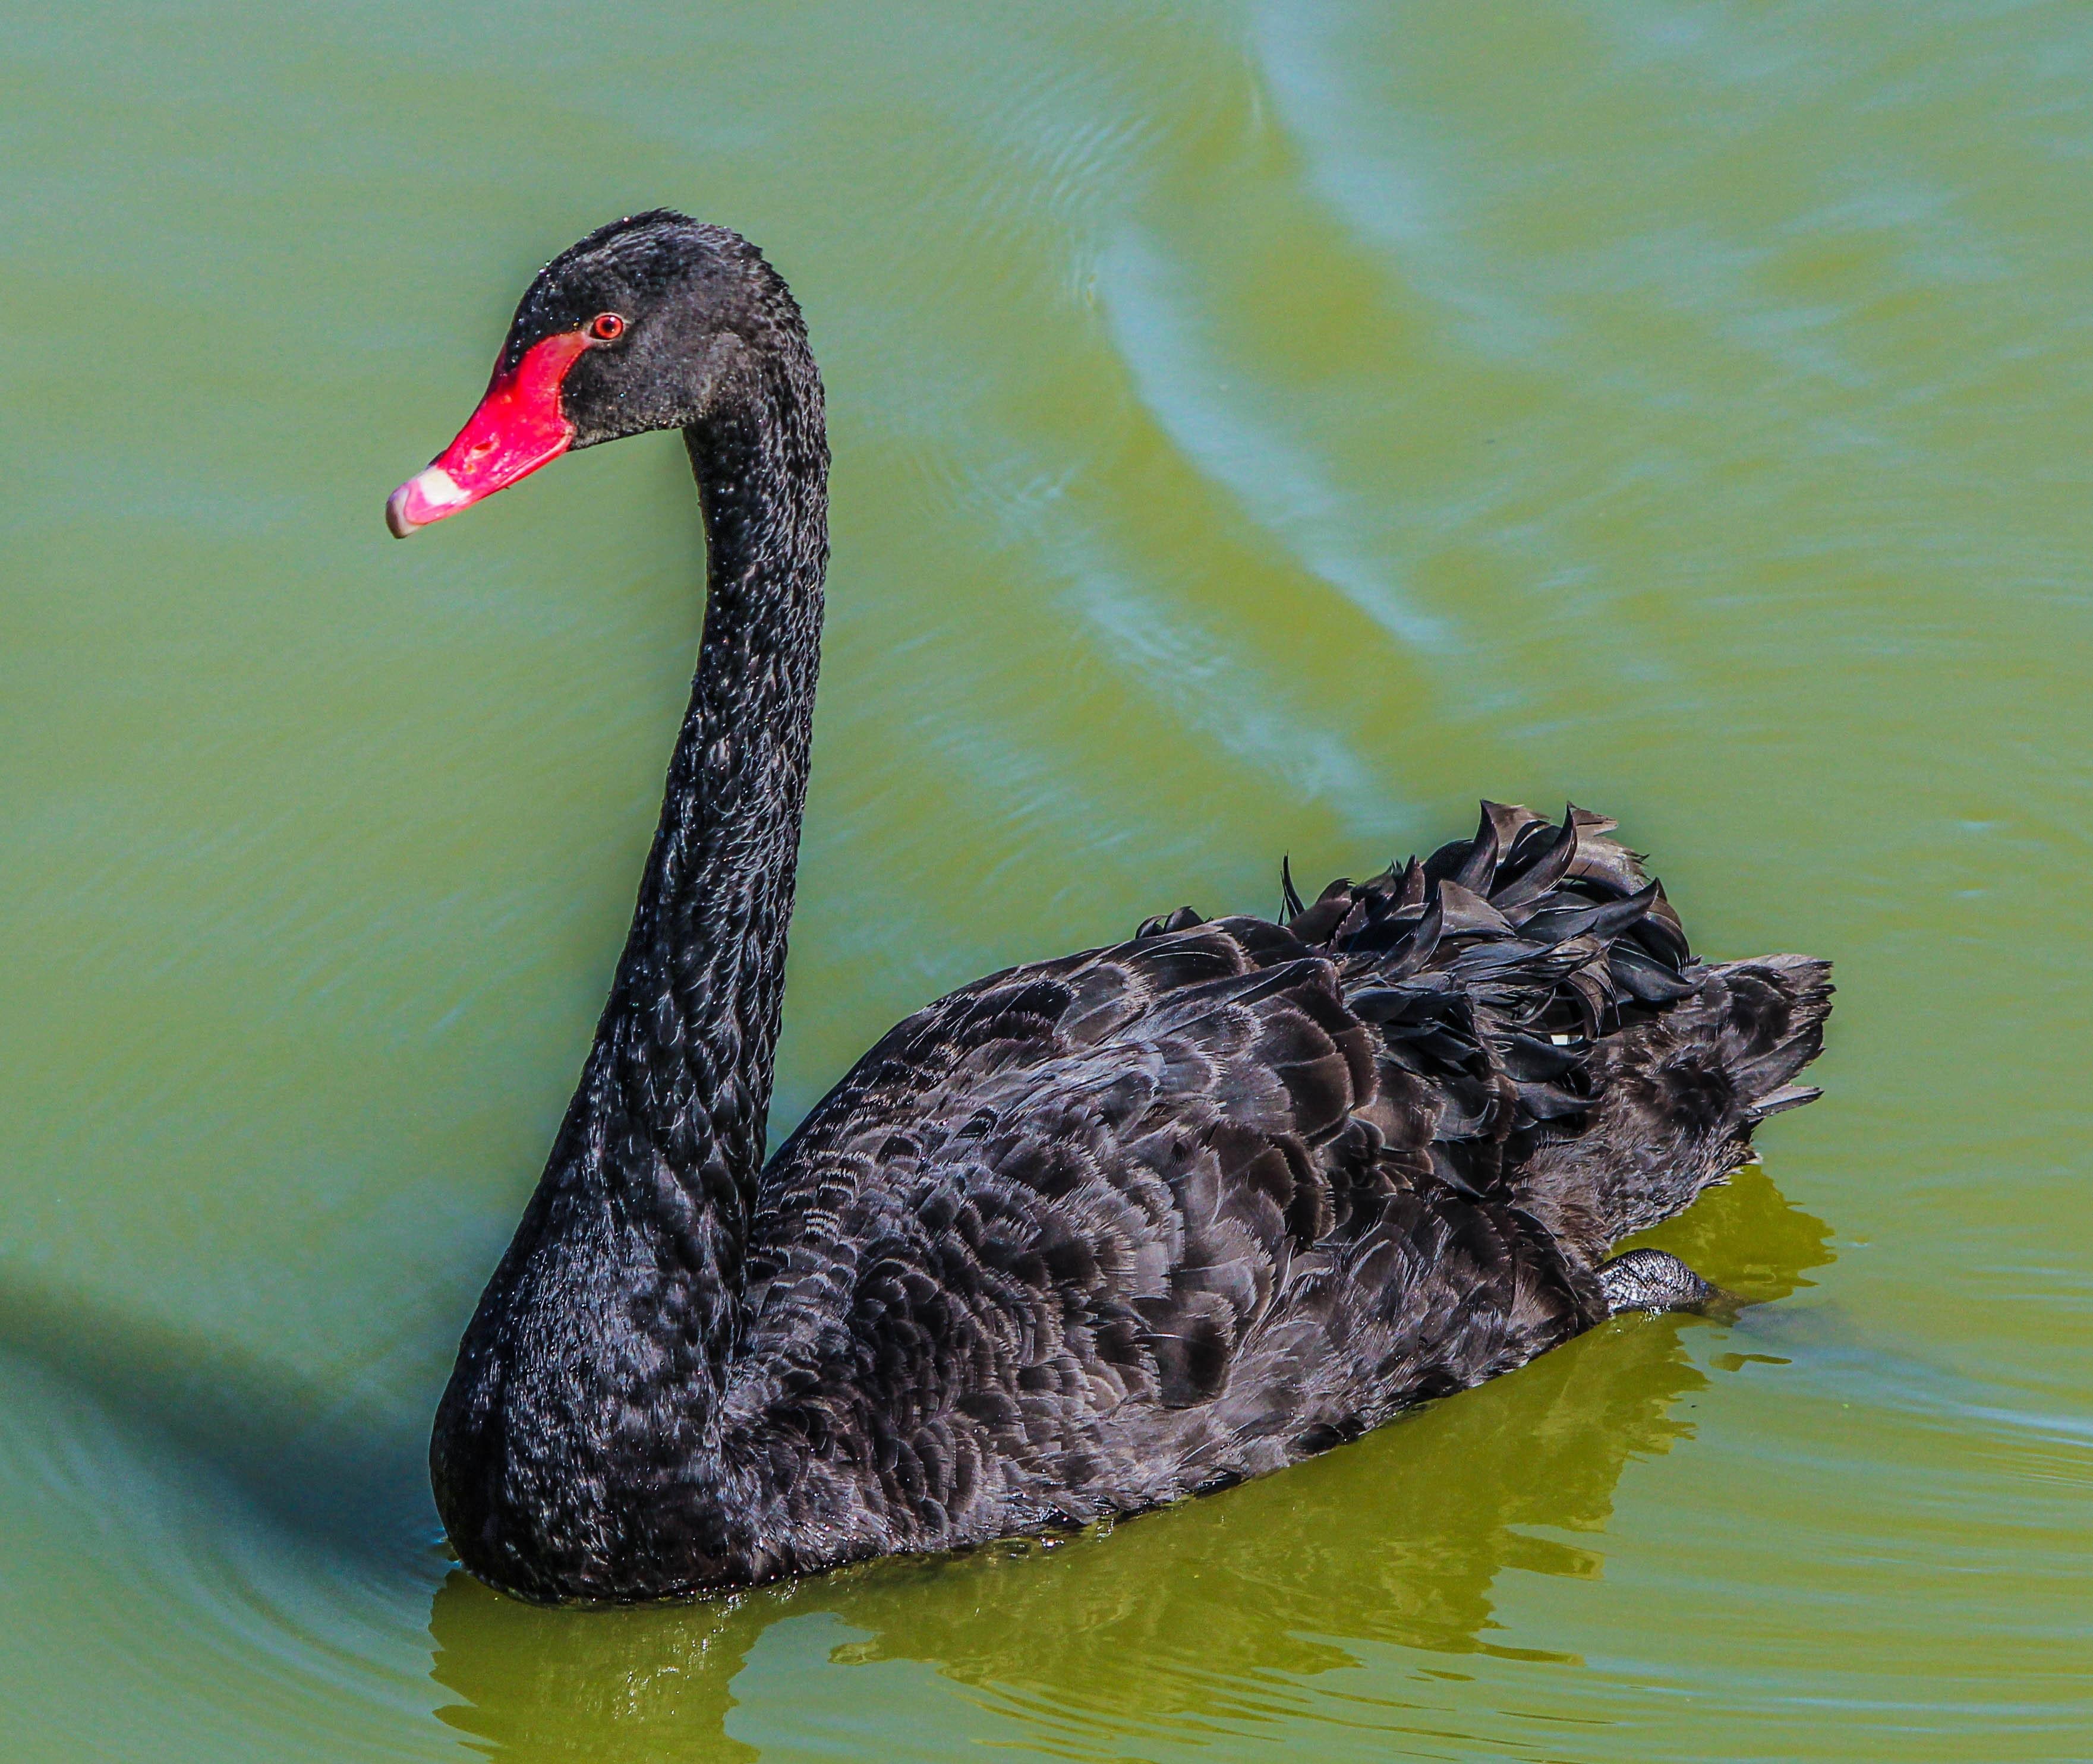 Black featheres red beak bird swim on the surface of water photo